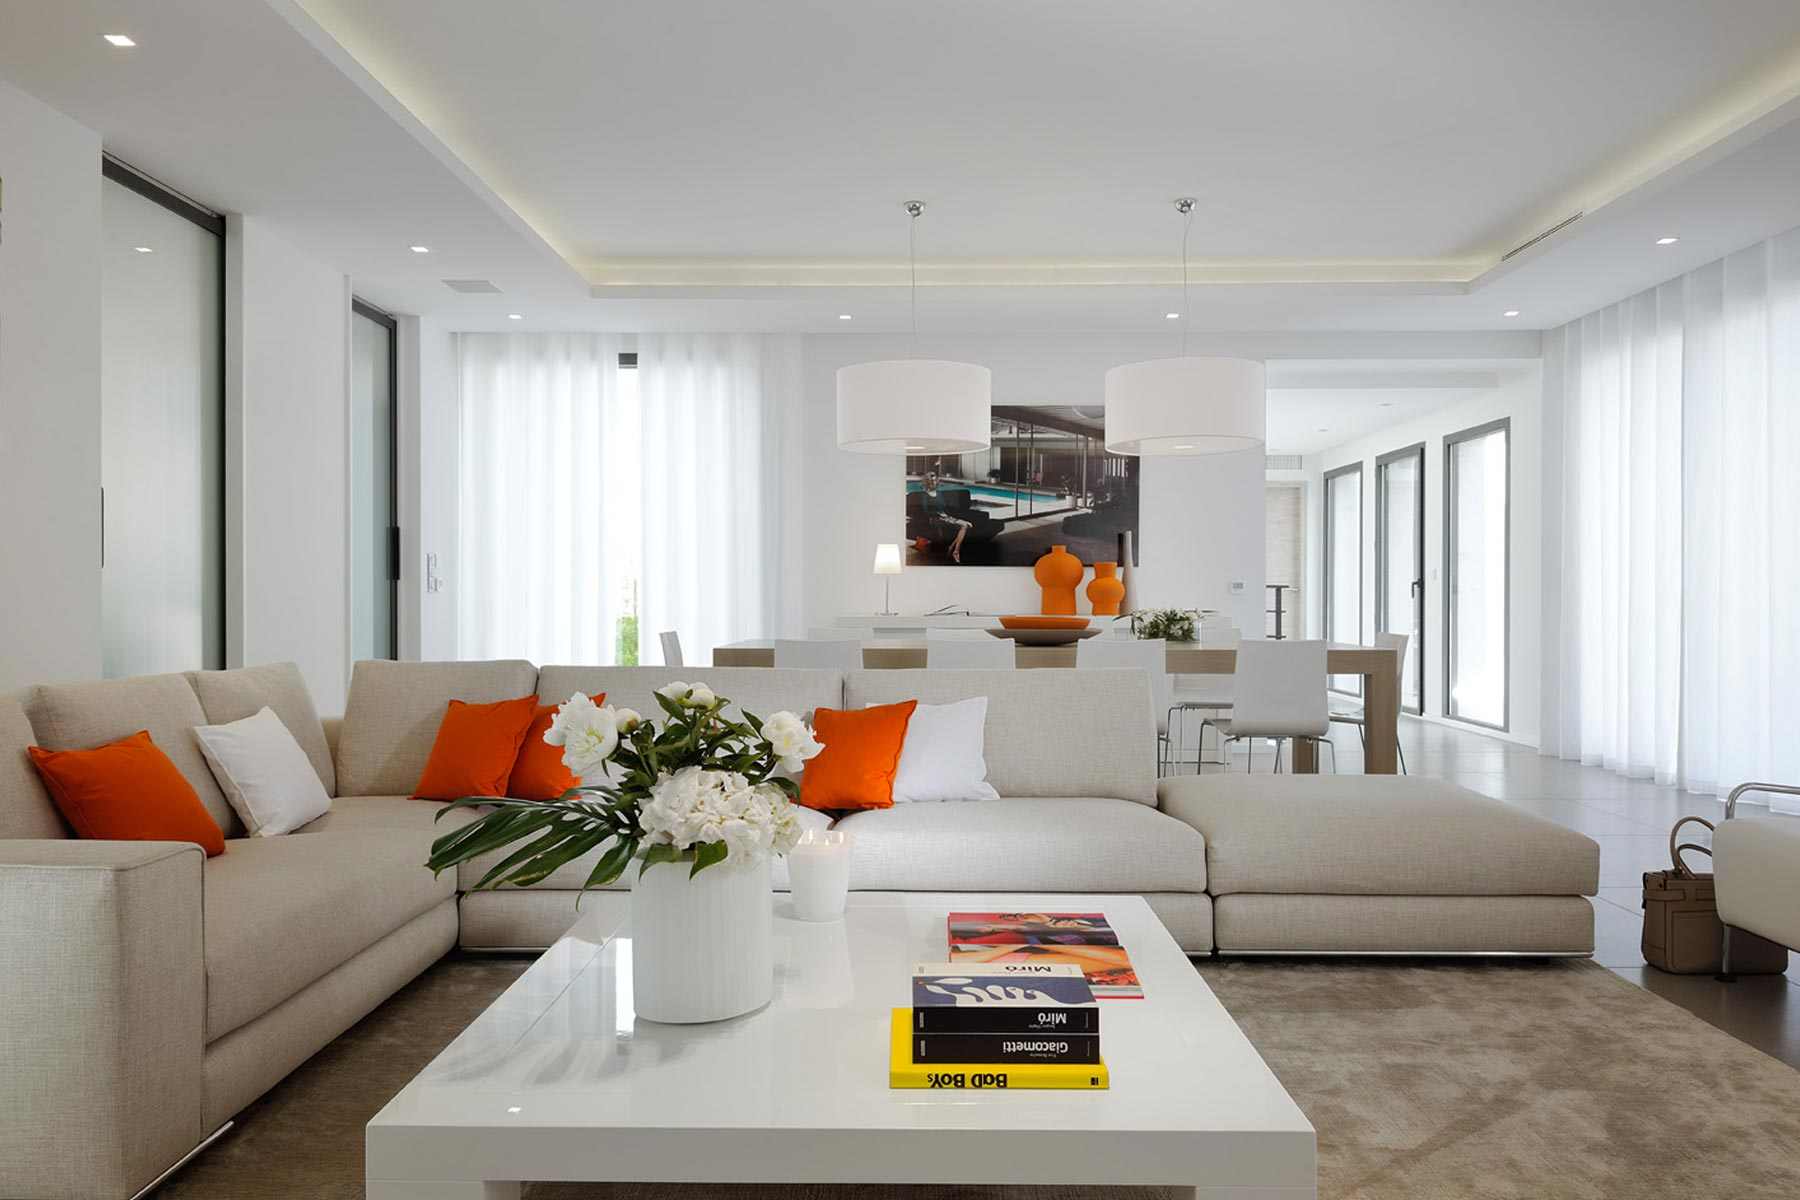 amnagement appartement 70m2 great nos ralisations with amnagement appartement 70m2 ok. Black Bedroom Furniture Sets. Home Design Ideas